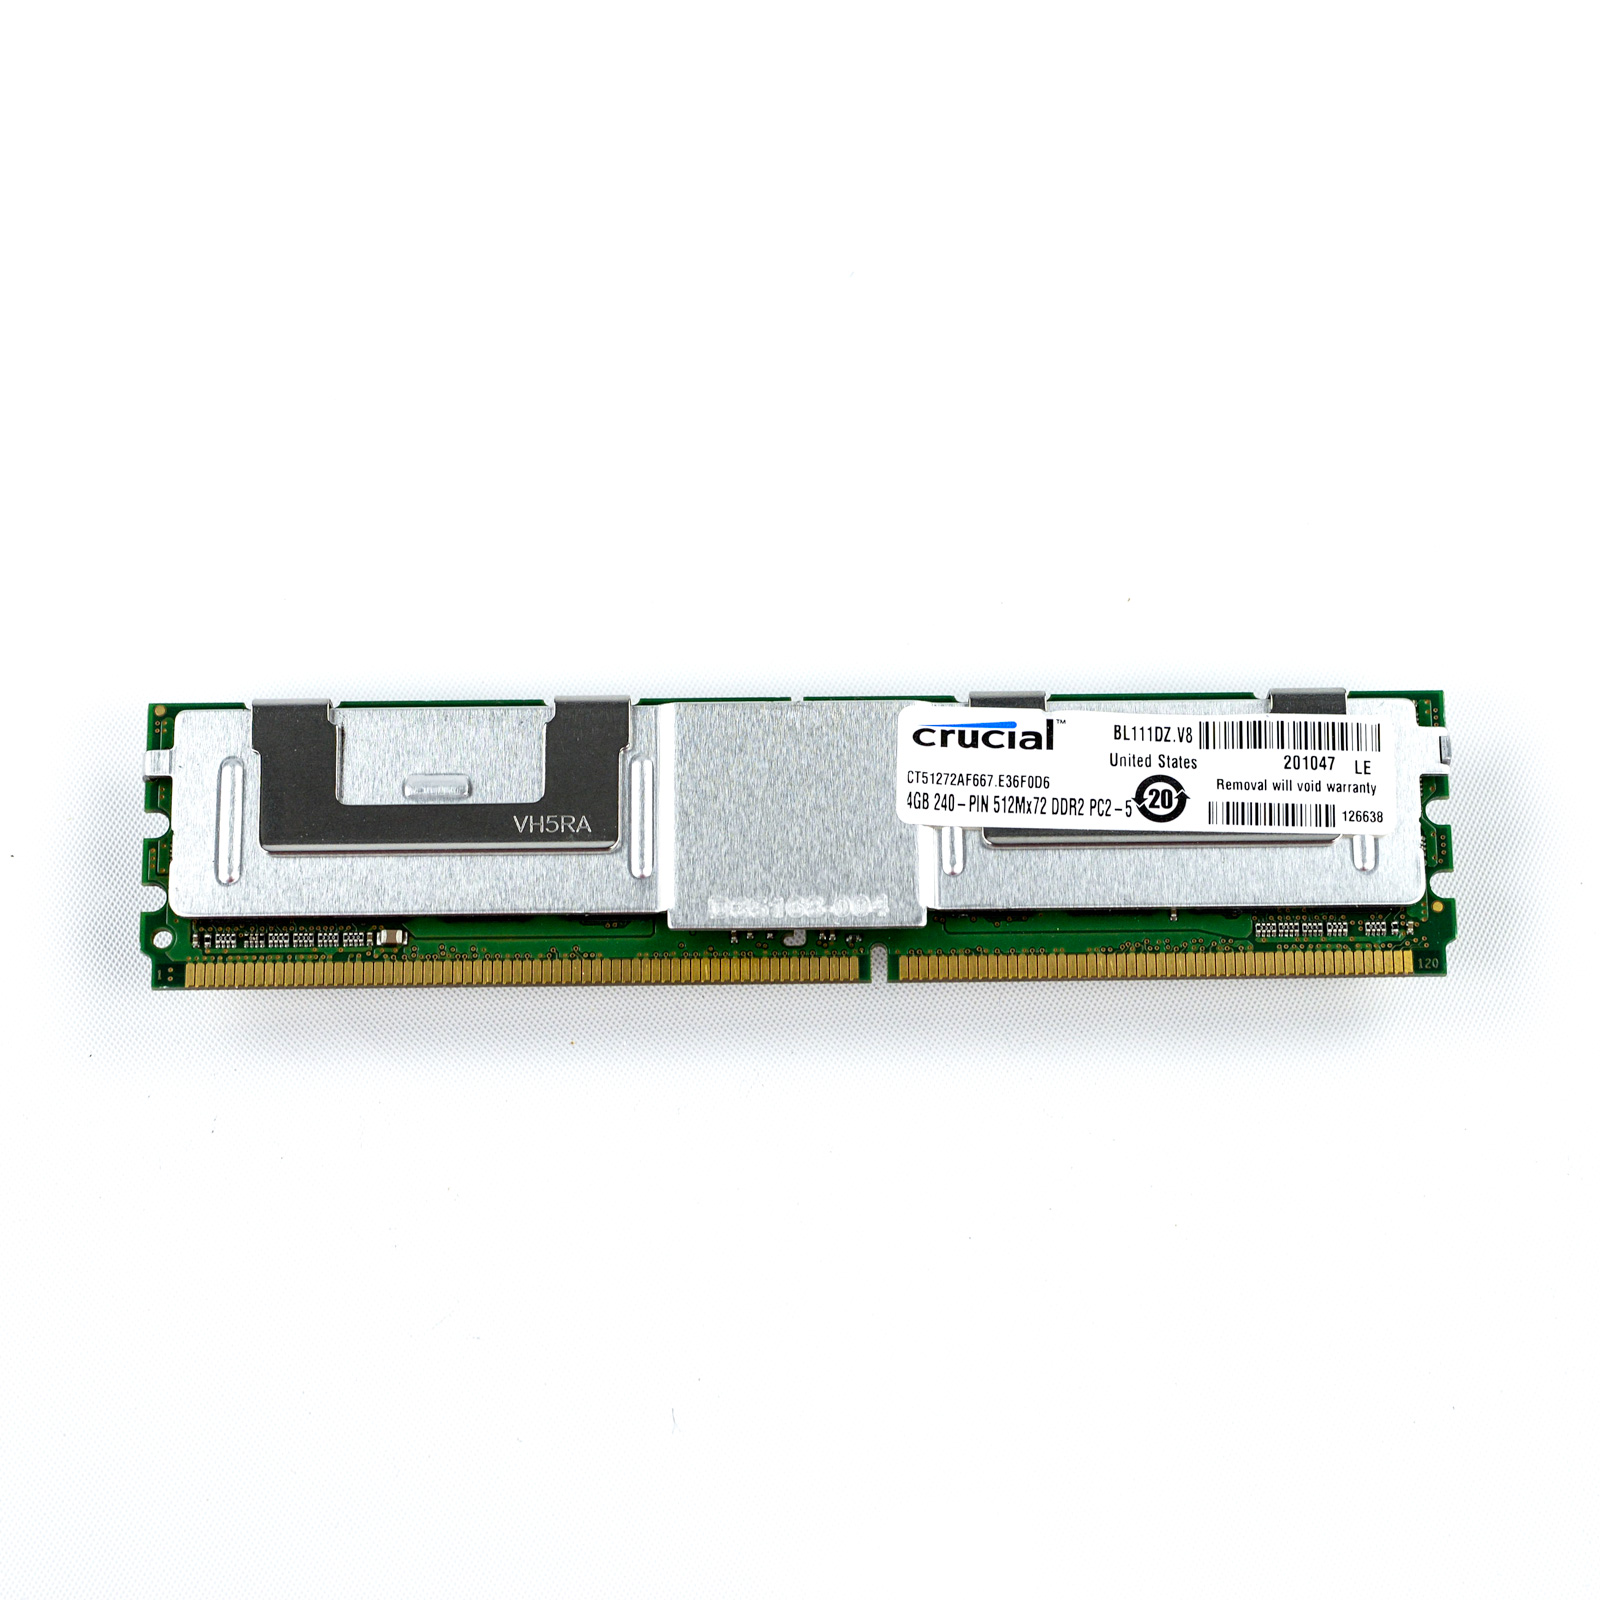 Crucial-4GB-FB-DIMM-ECC-Memory-Module-Sticks-2Rx4-DDR2-PC2-5300-CT51272AF667